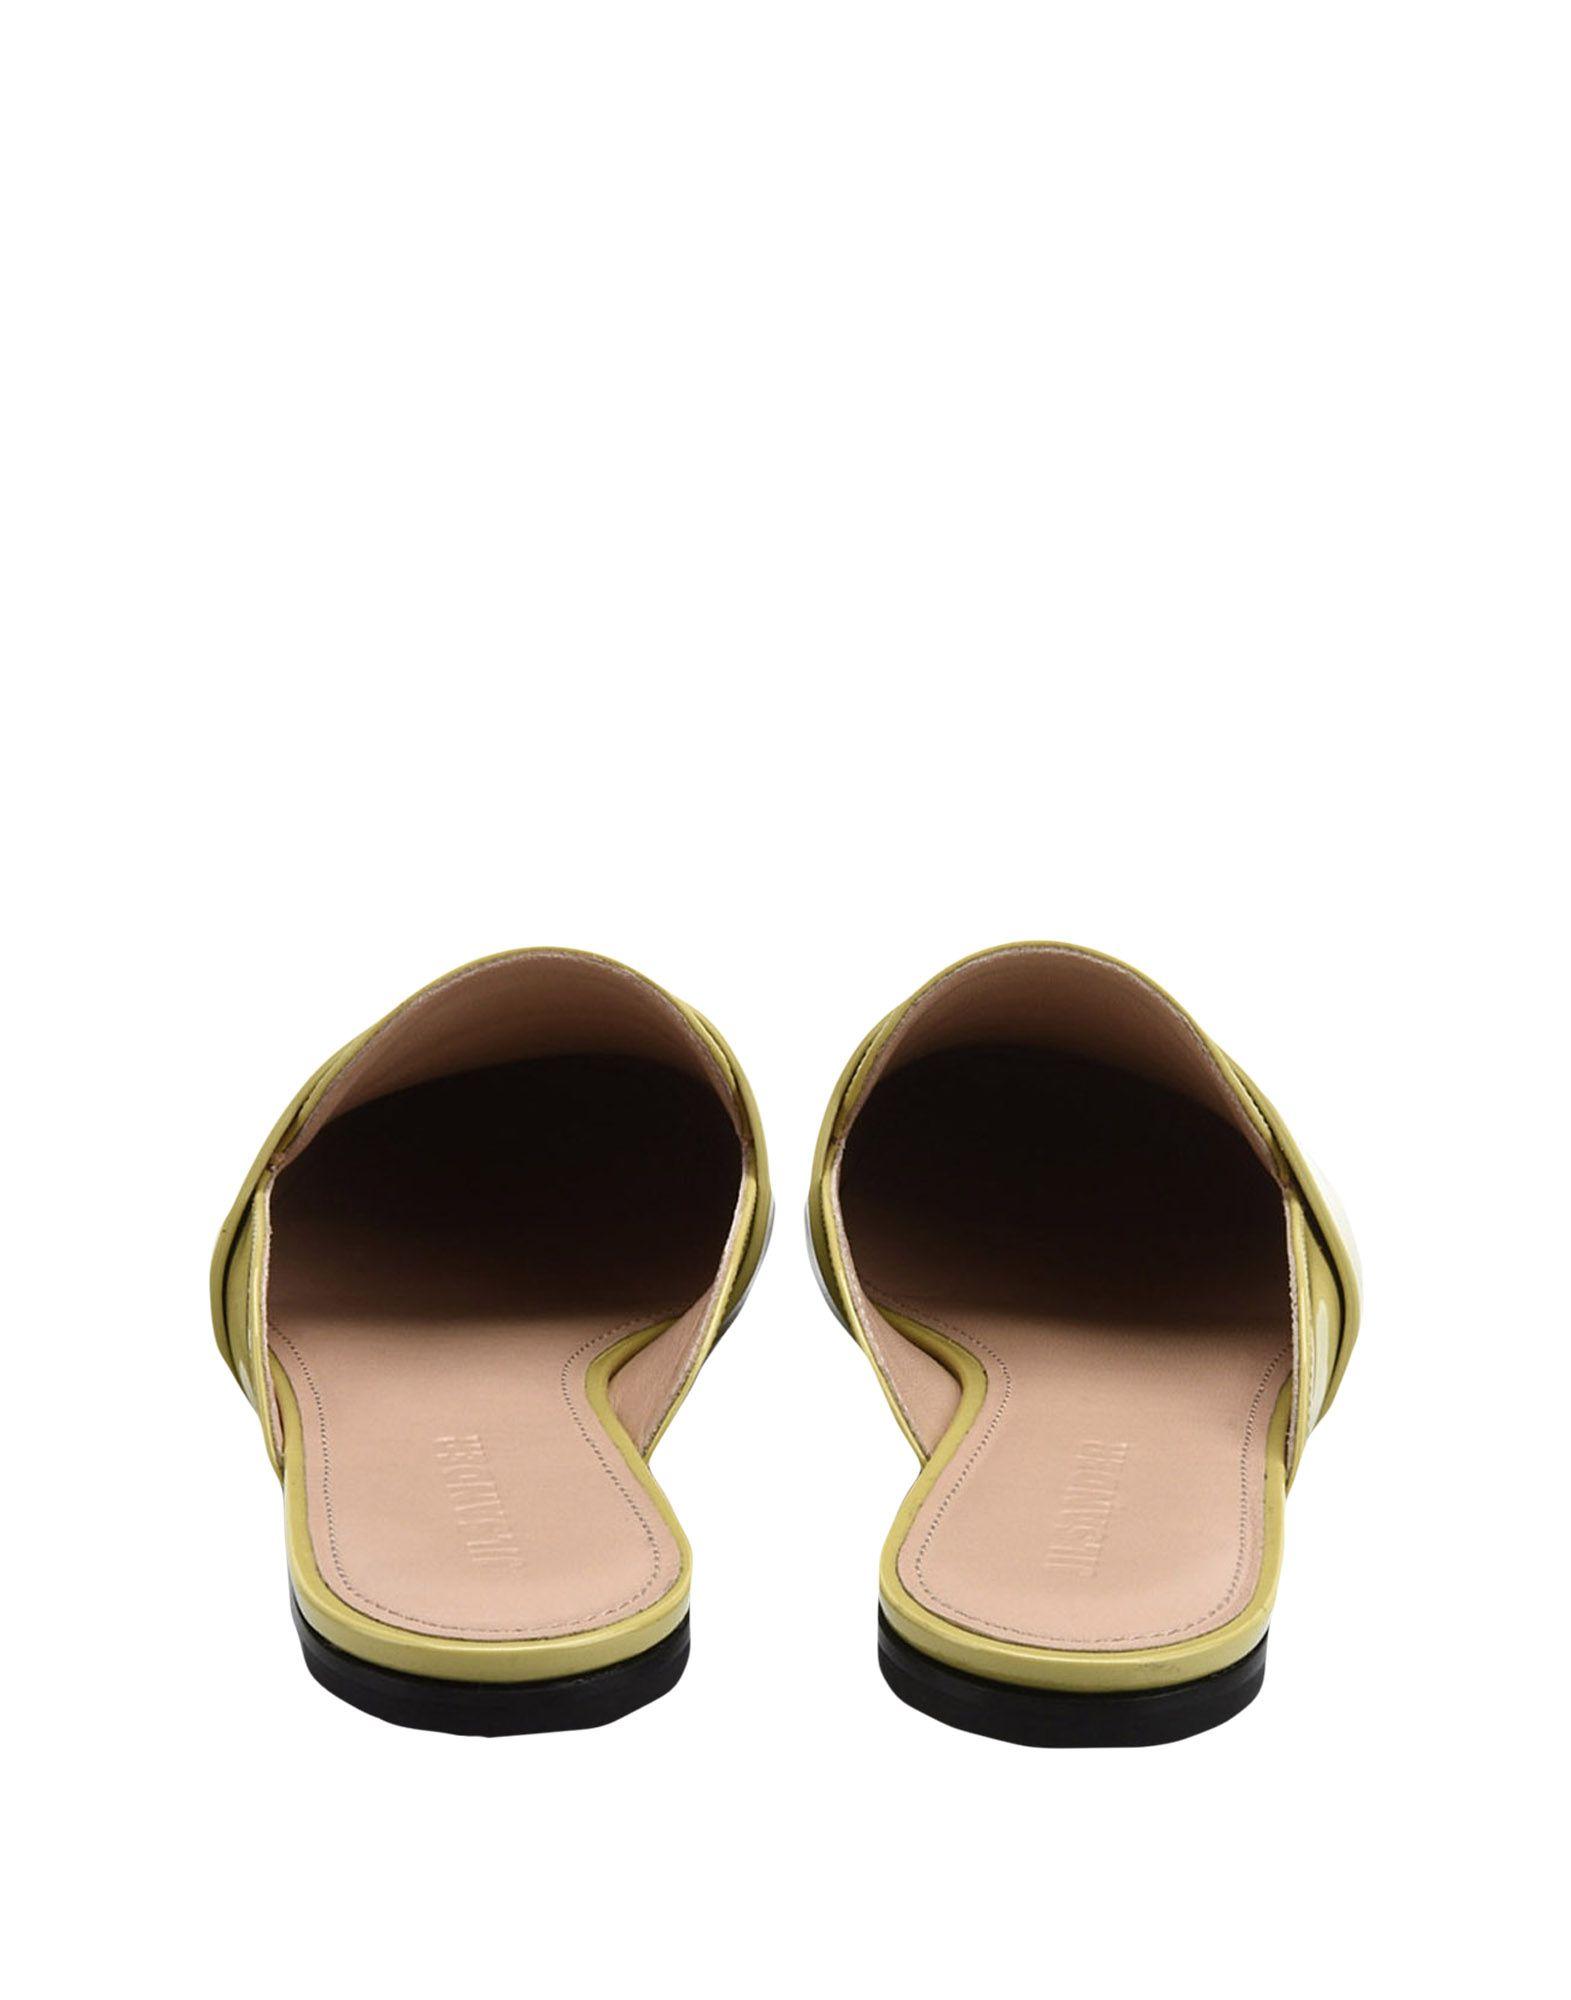 Stilvolle billige Schuhe Jil Sander 11435192CI Pantoletten Damen  11435192CI Sander 3e0d48